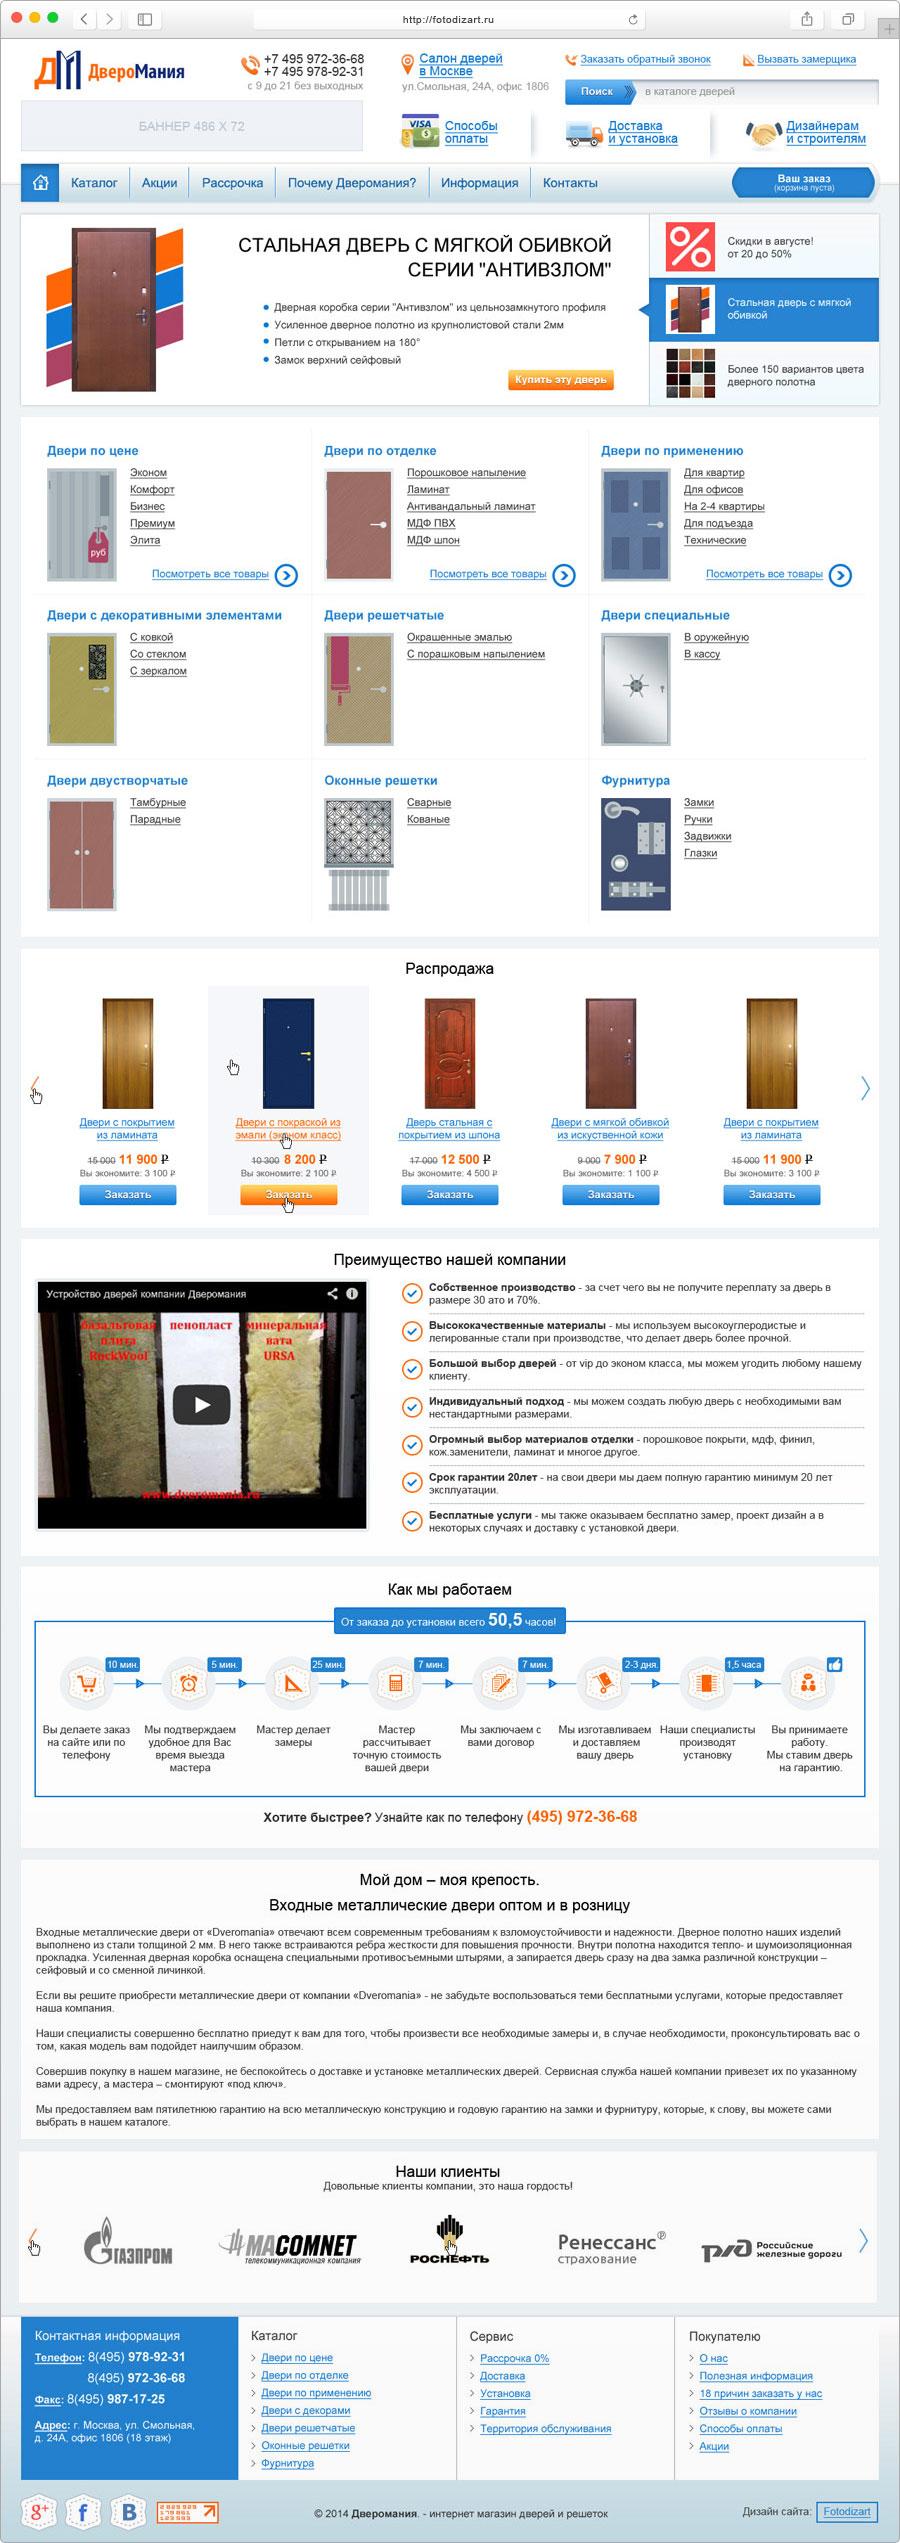 дизайн интернет-каталога